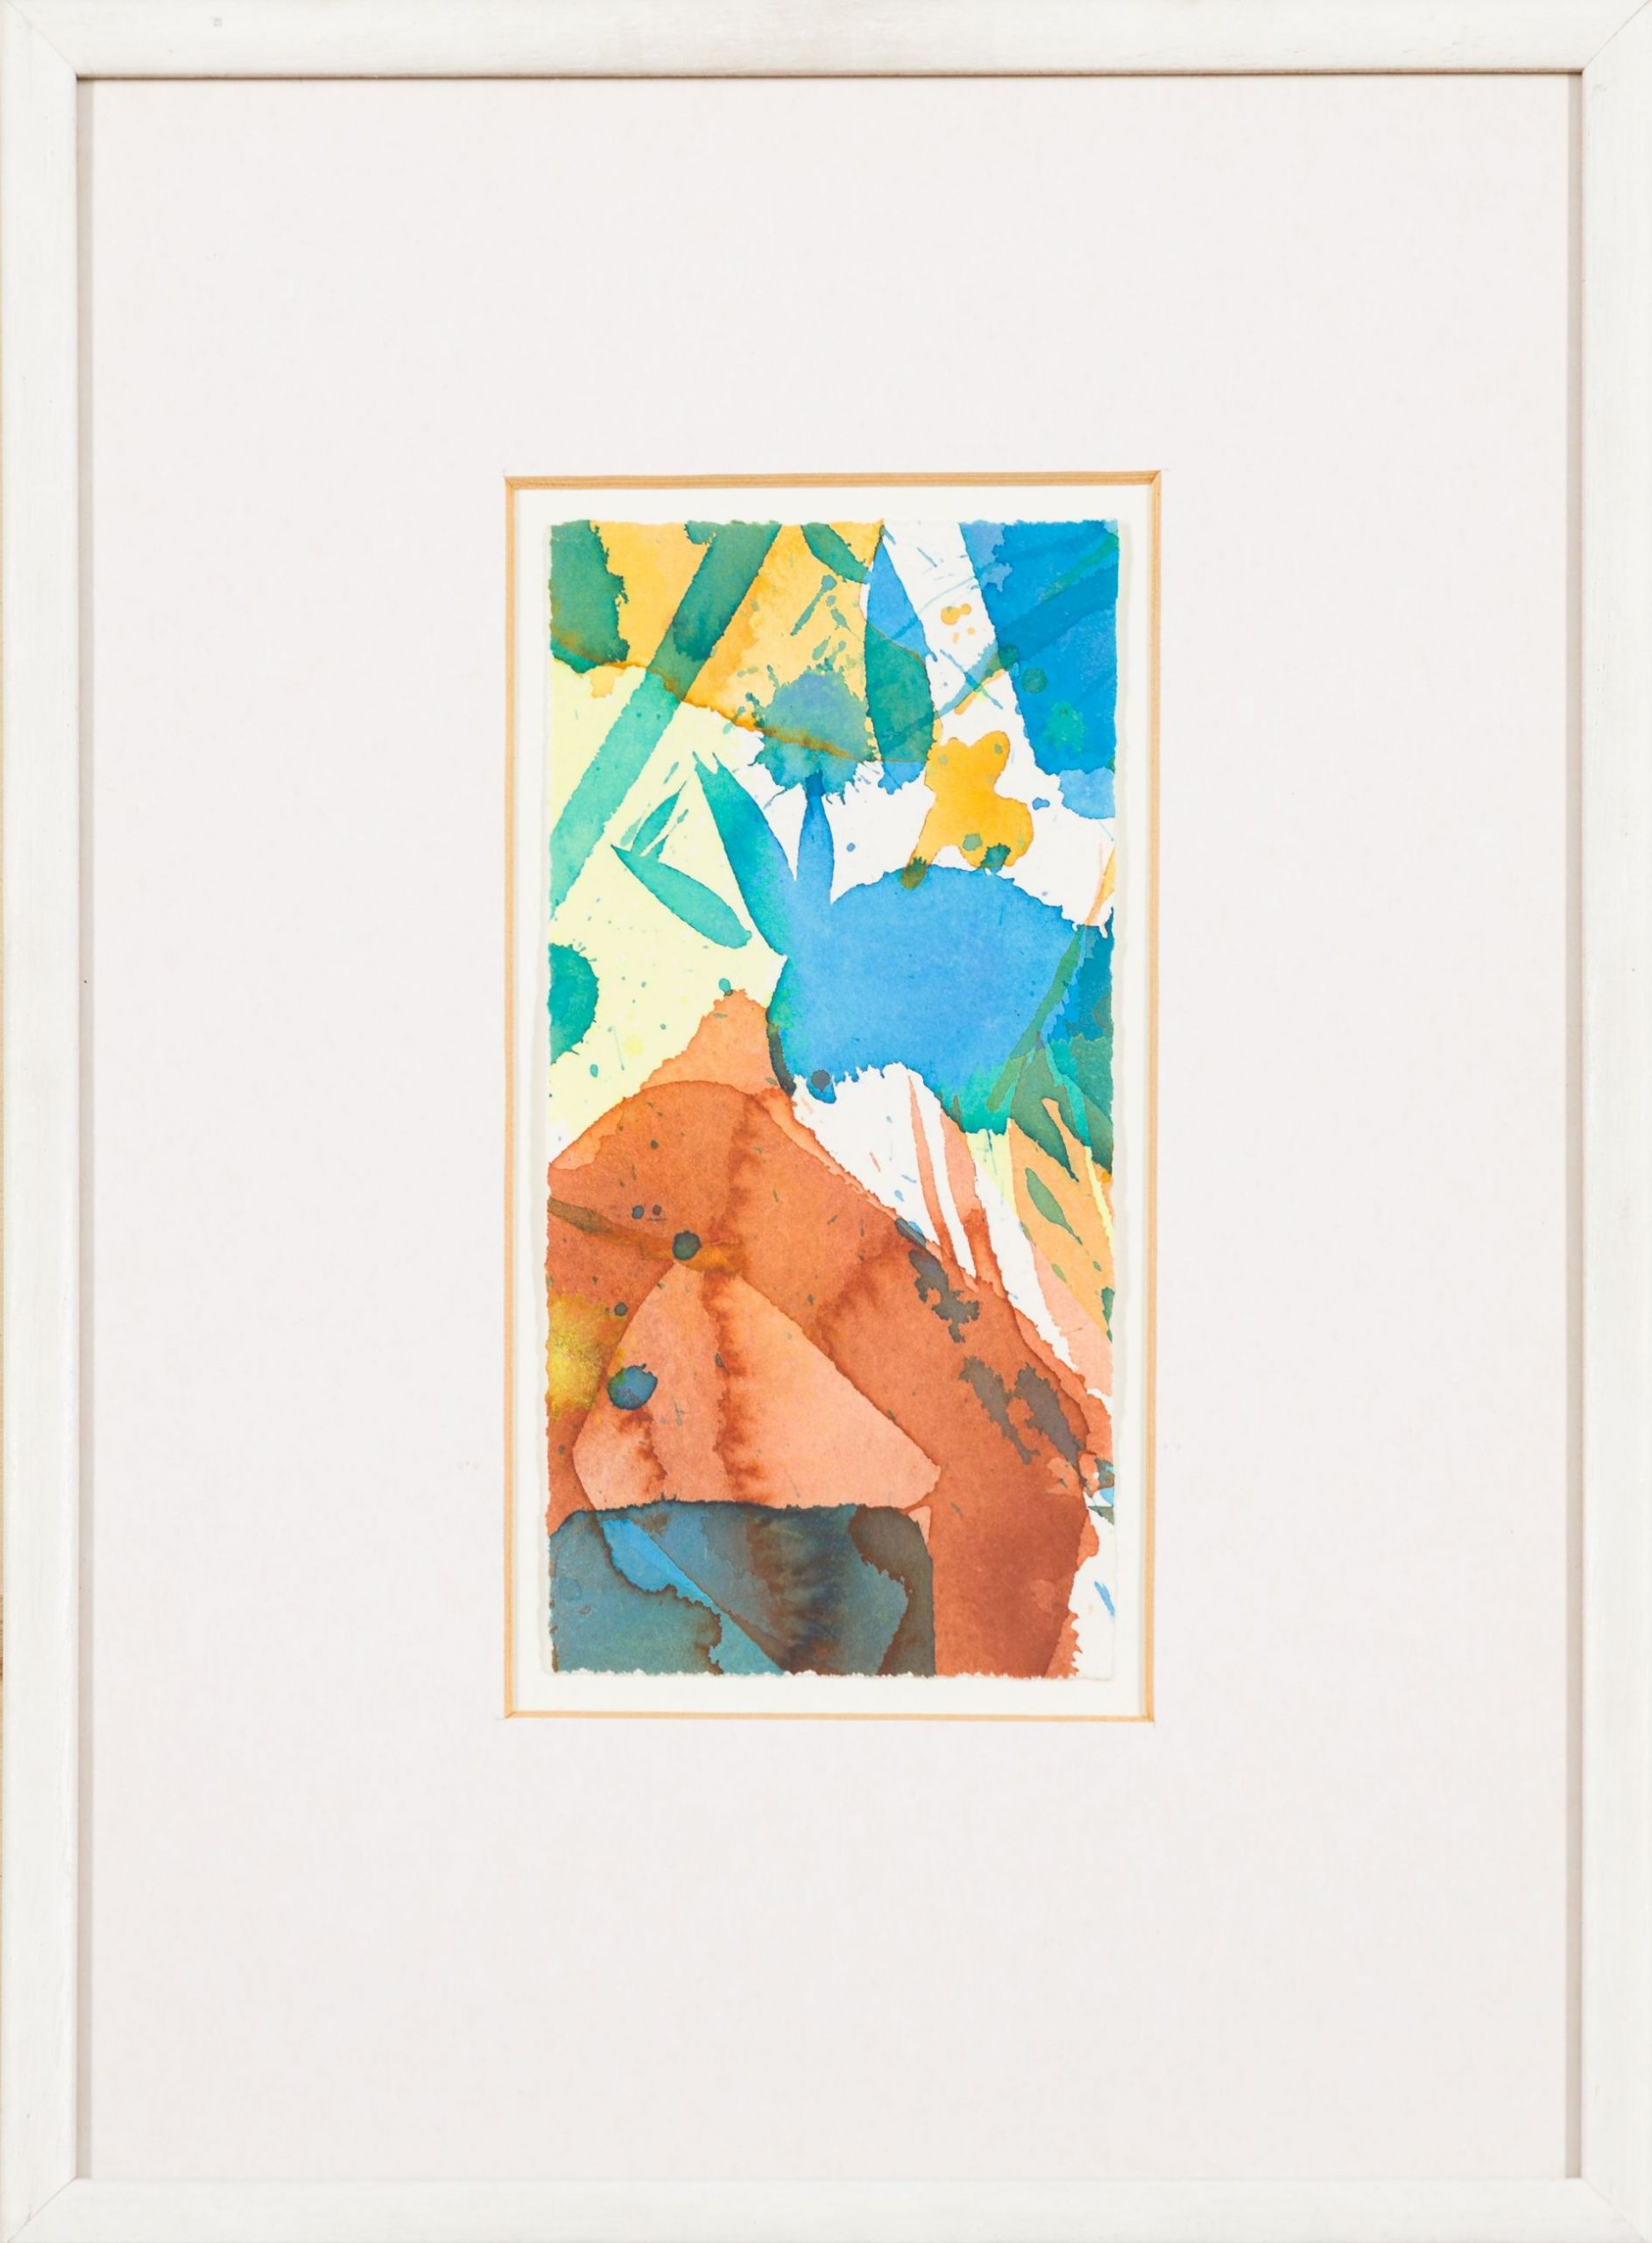 Unbekannt-Abstract Composition